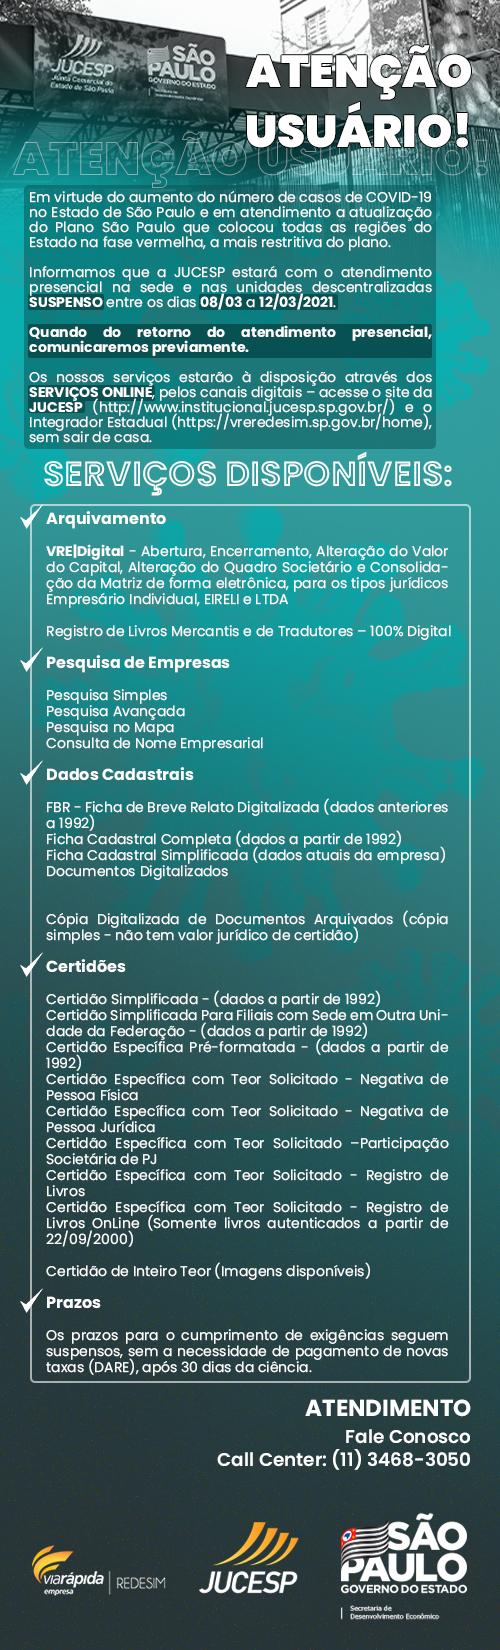 JUCESP SUSPENDE ATENDIMENTO PRESENCIAL ENTRE OS DIAS 08 A 12 DE MARÇO 2021